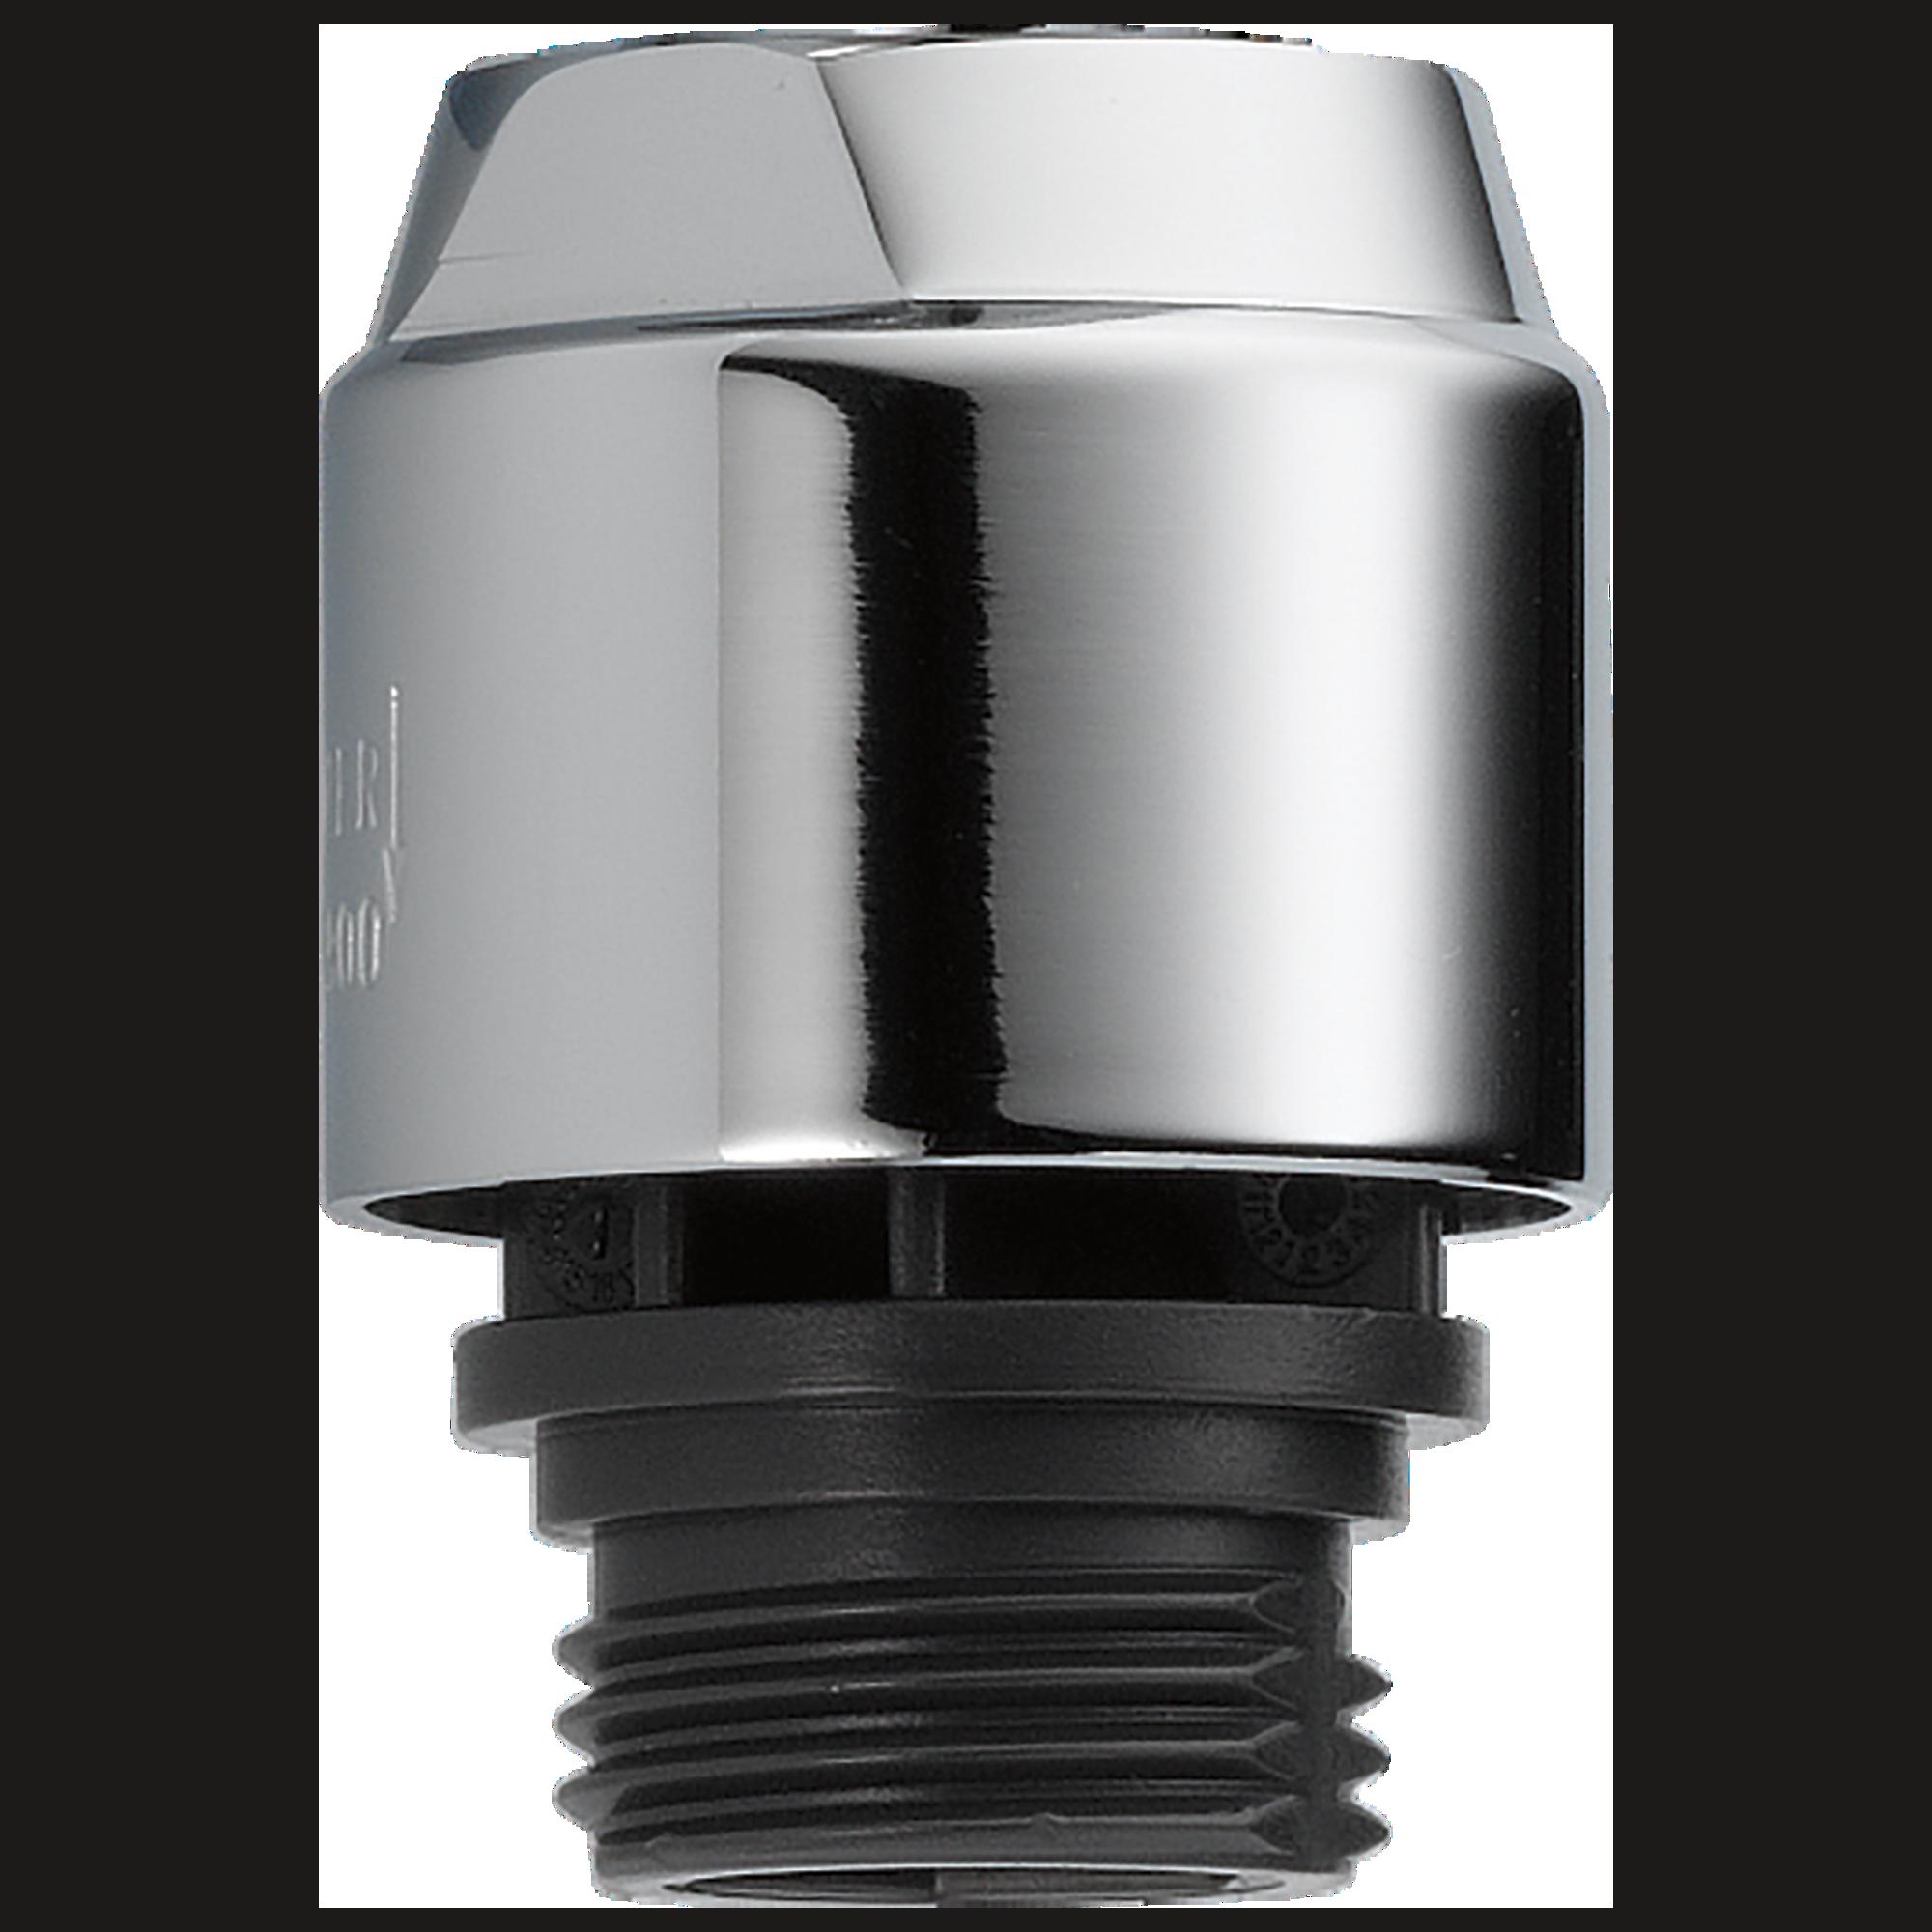 Universal Showering Components: Vacuum Breaker